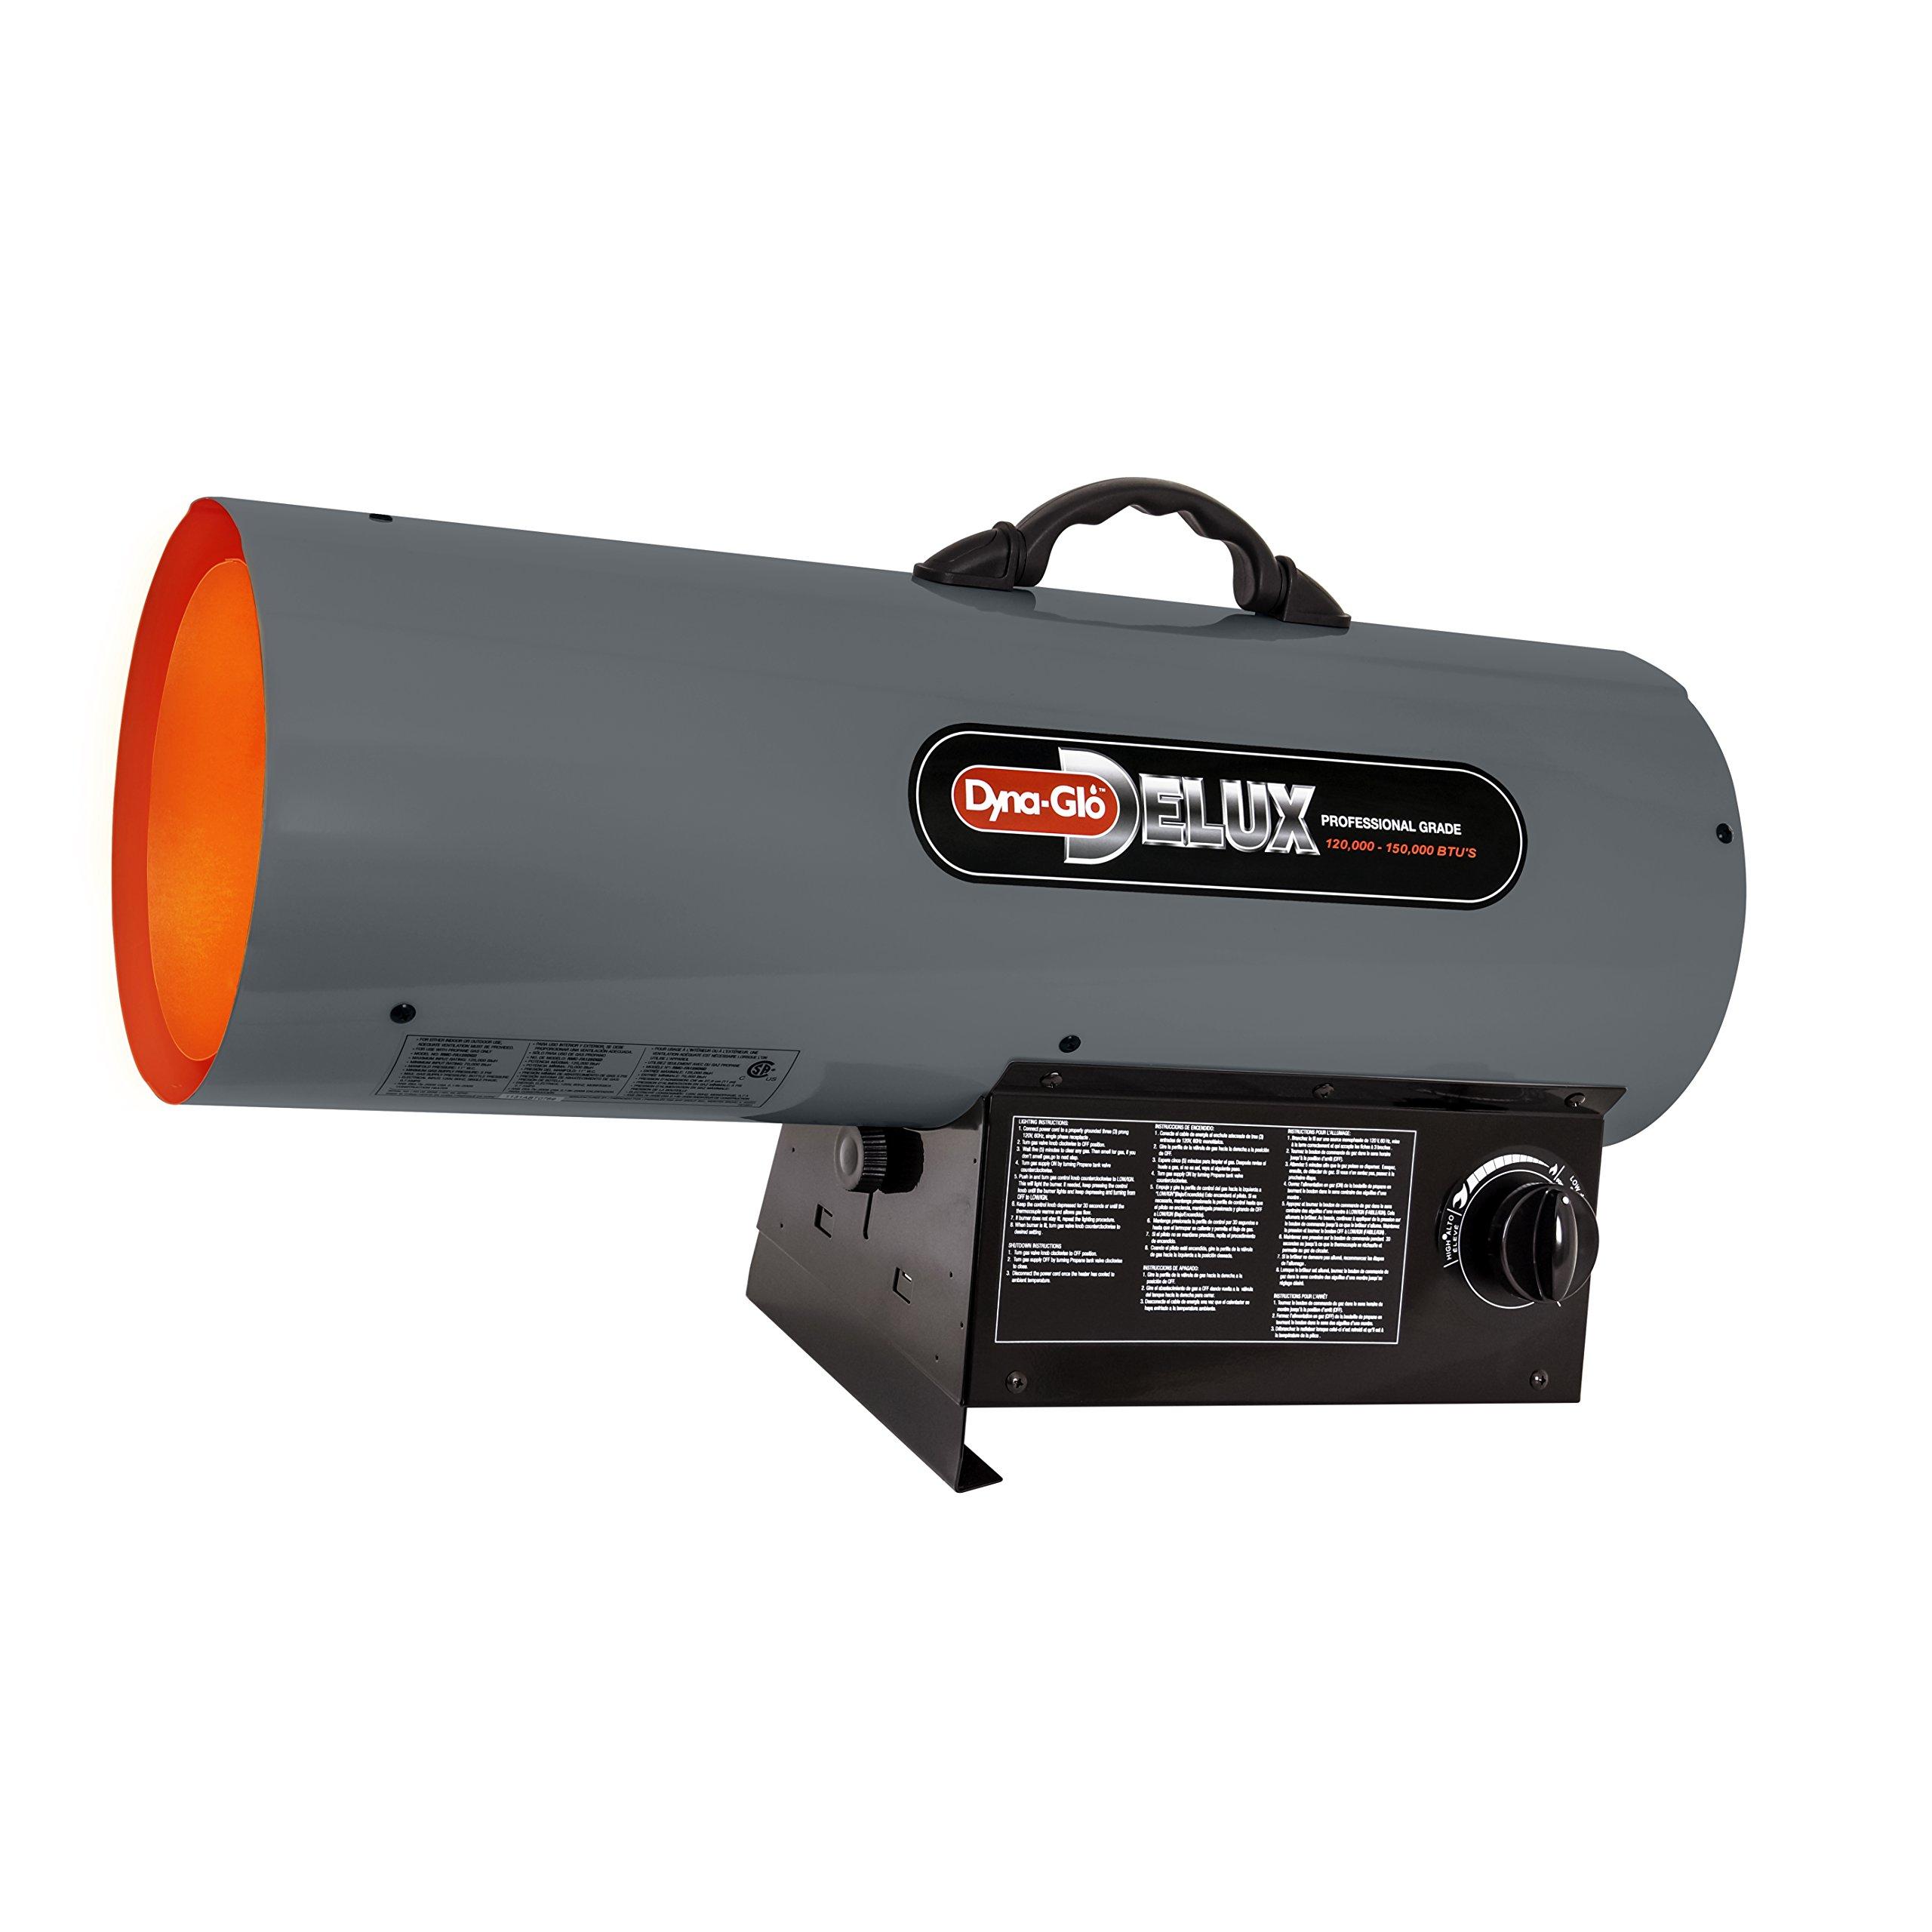 Dyna-Glo RMC-FA150DGD 120,000 - 150,000 BTU Liquid Propane Forced Air Heater